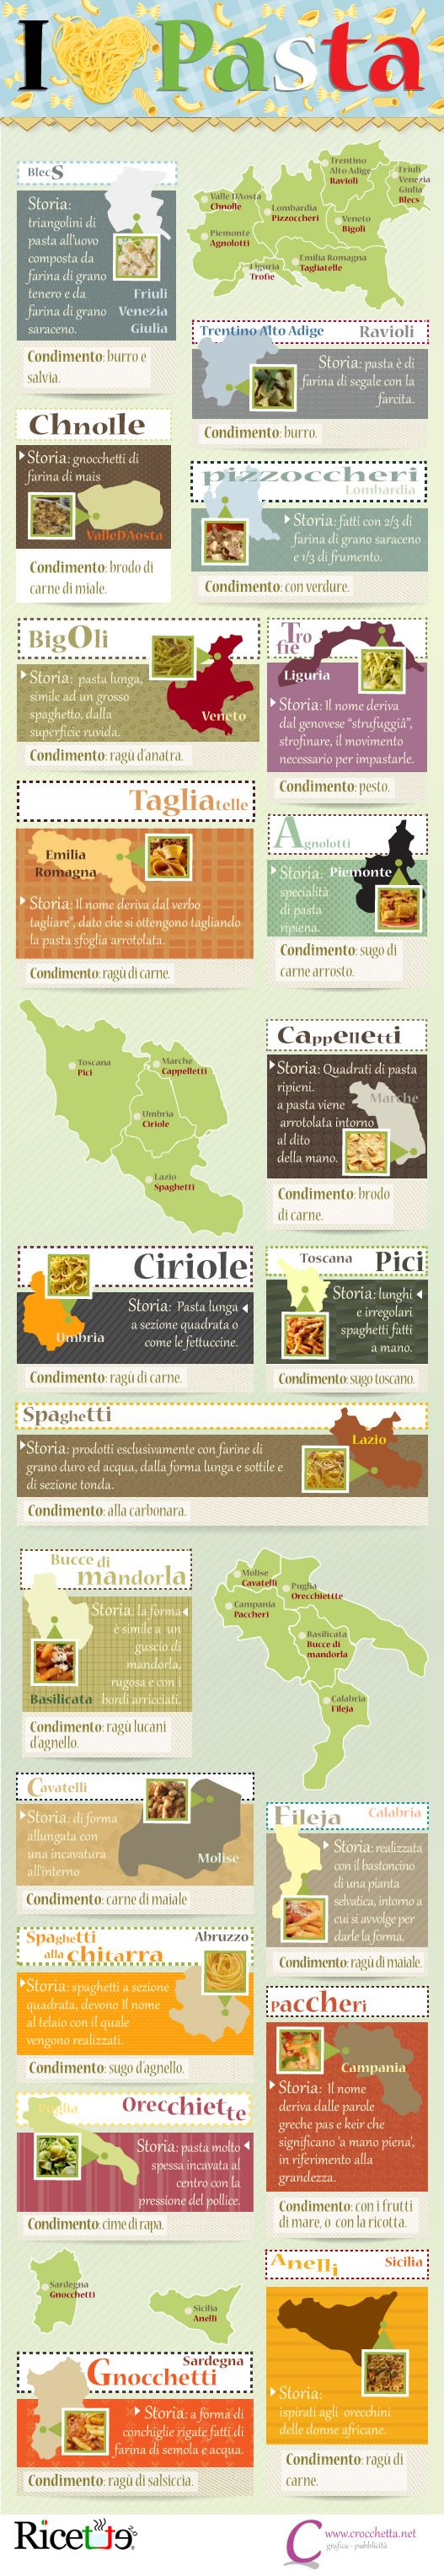 Regional Italian pasta.